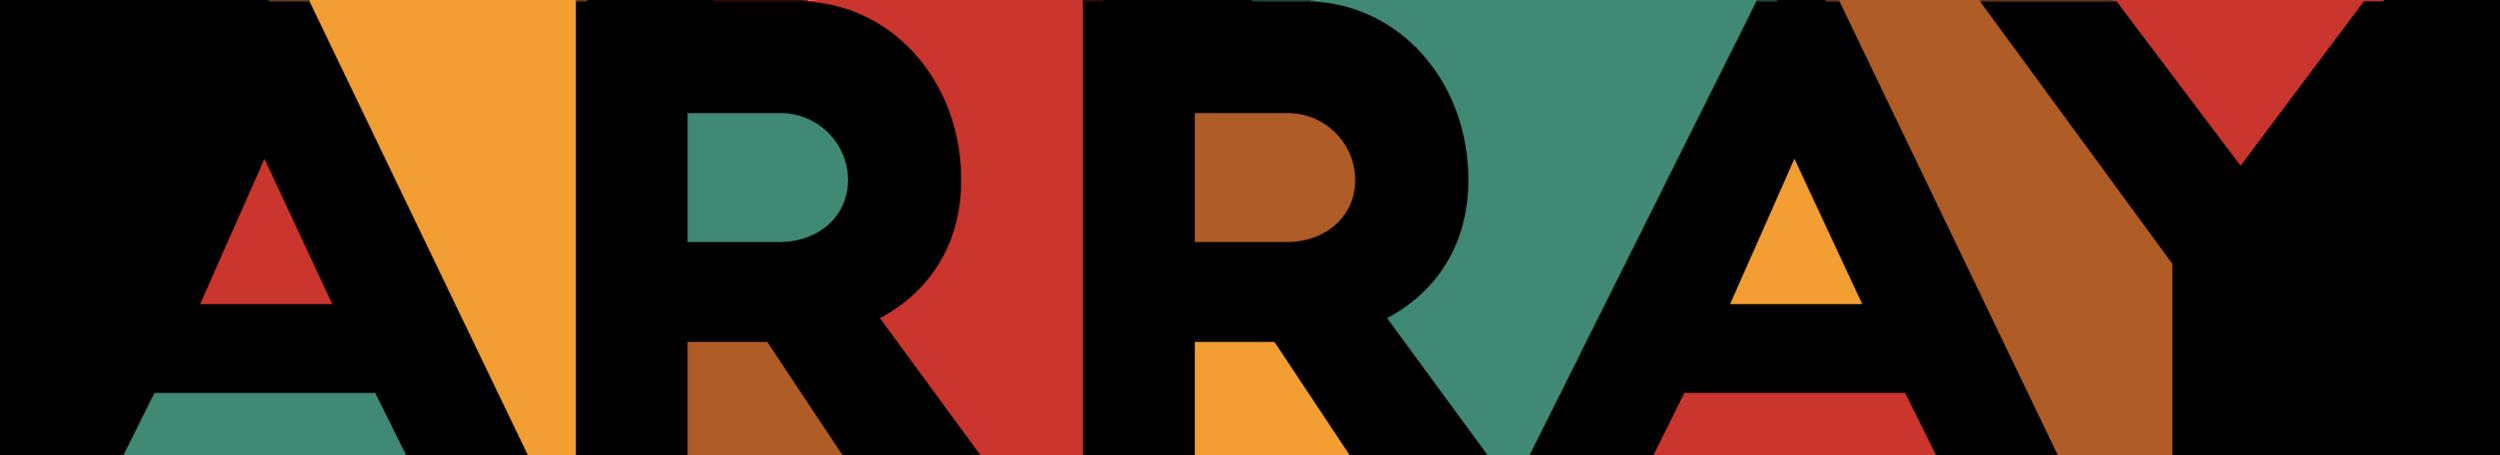 ARRAY_logo2019 (2) (1).png